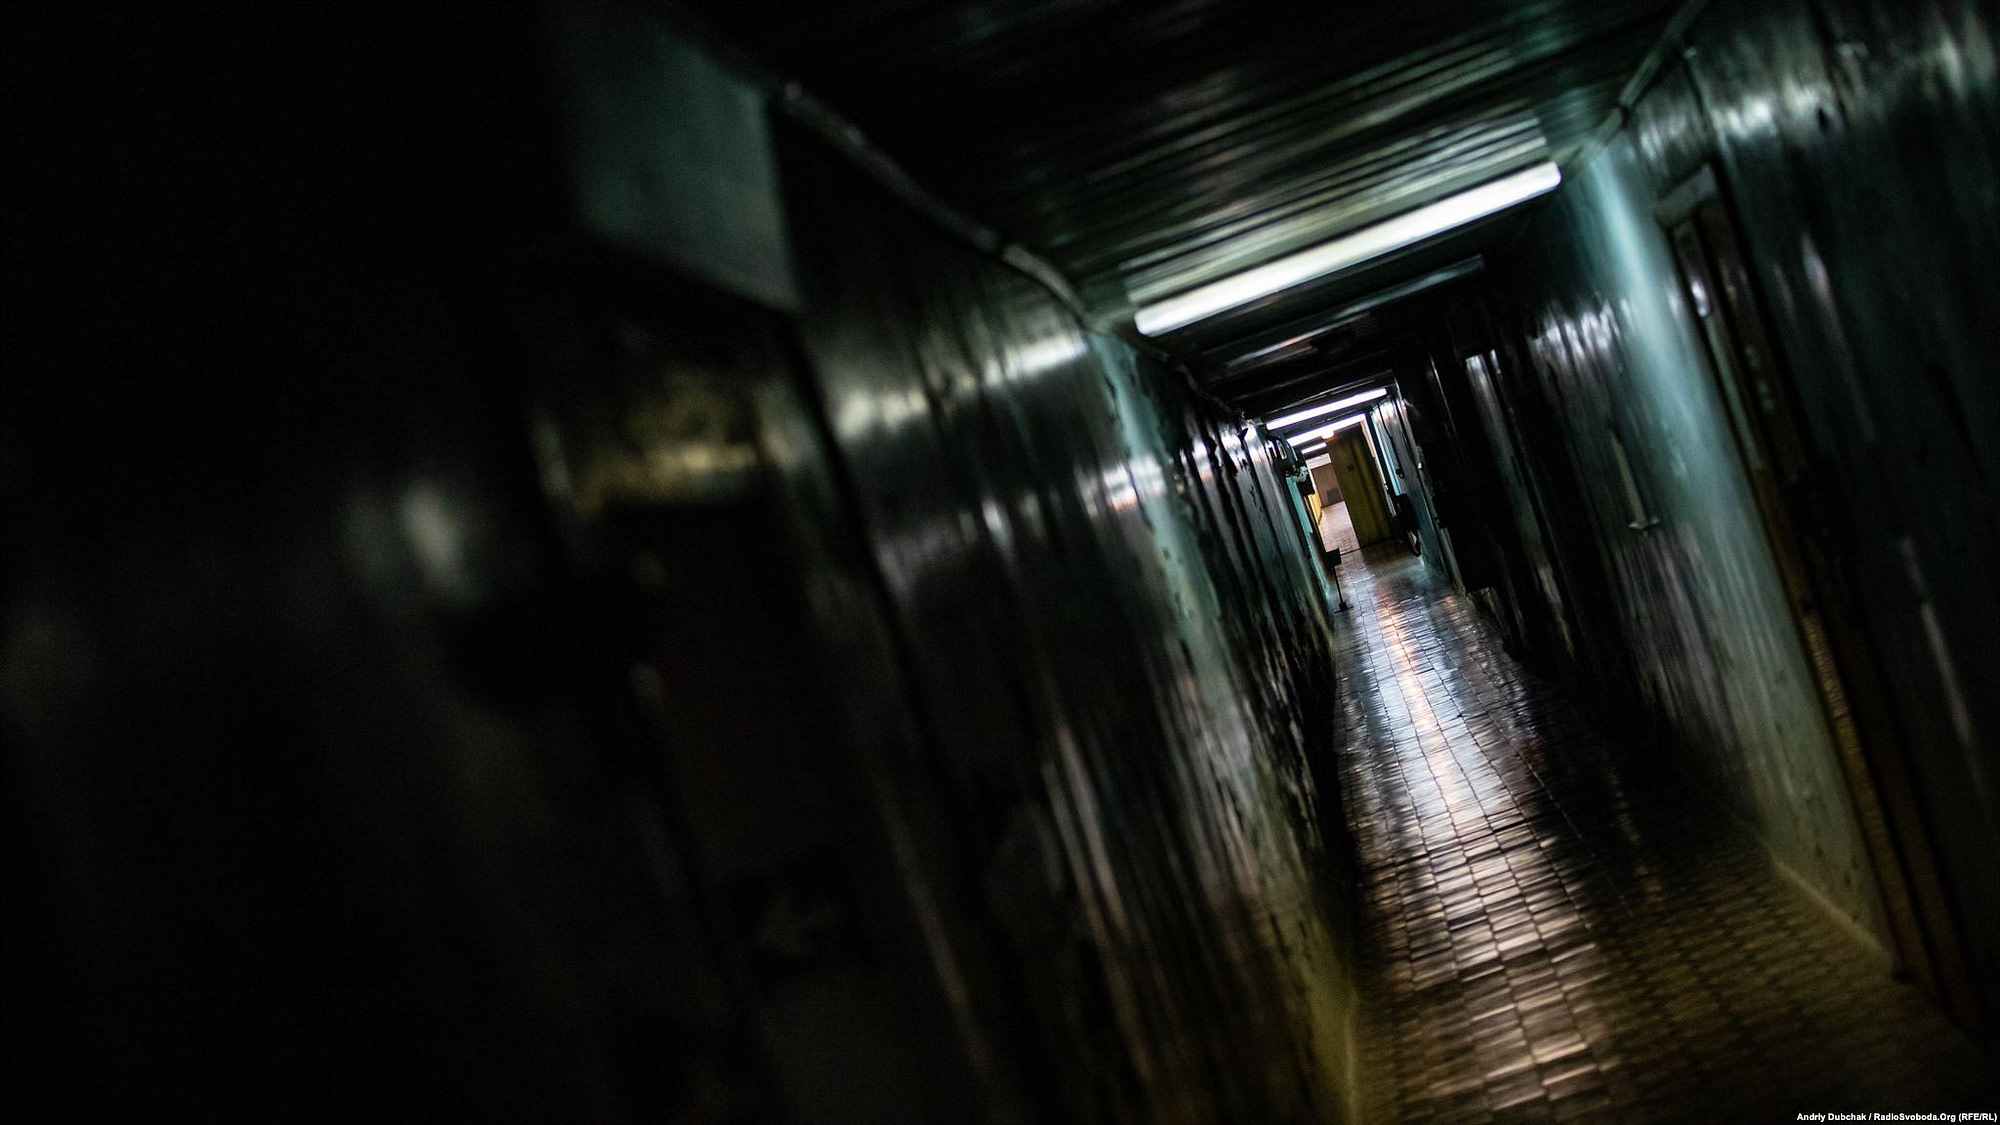 «Золотий коридор» проходить крізь об'єкт «Укриття». Нам – усередину (Photographer: Andriy Dubchak)